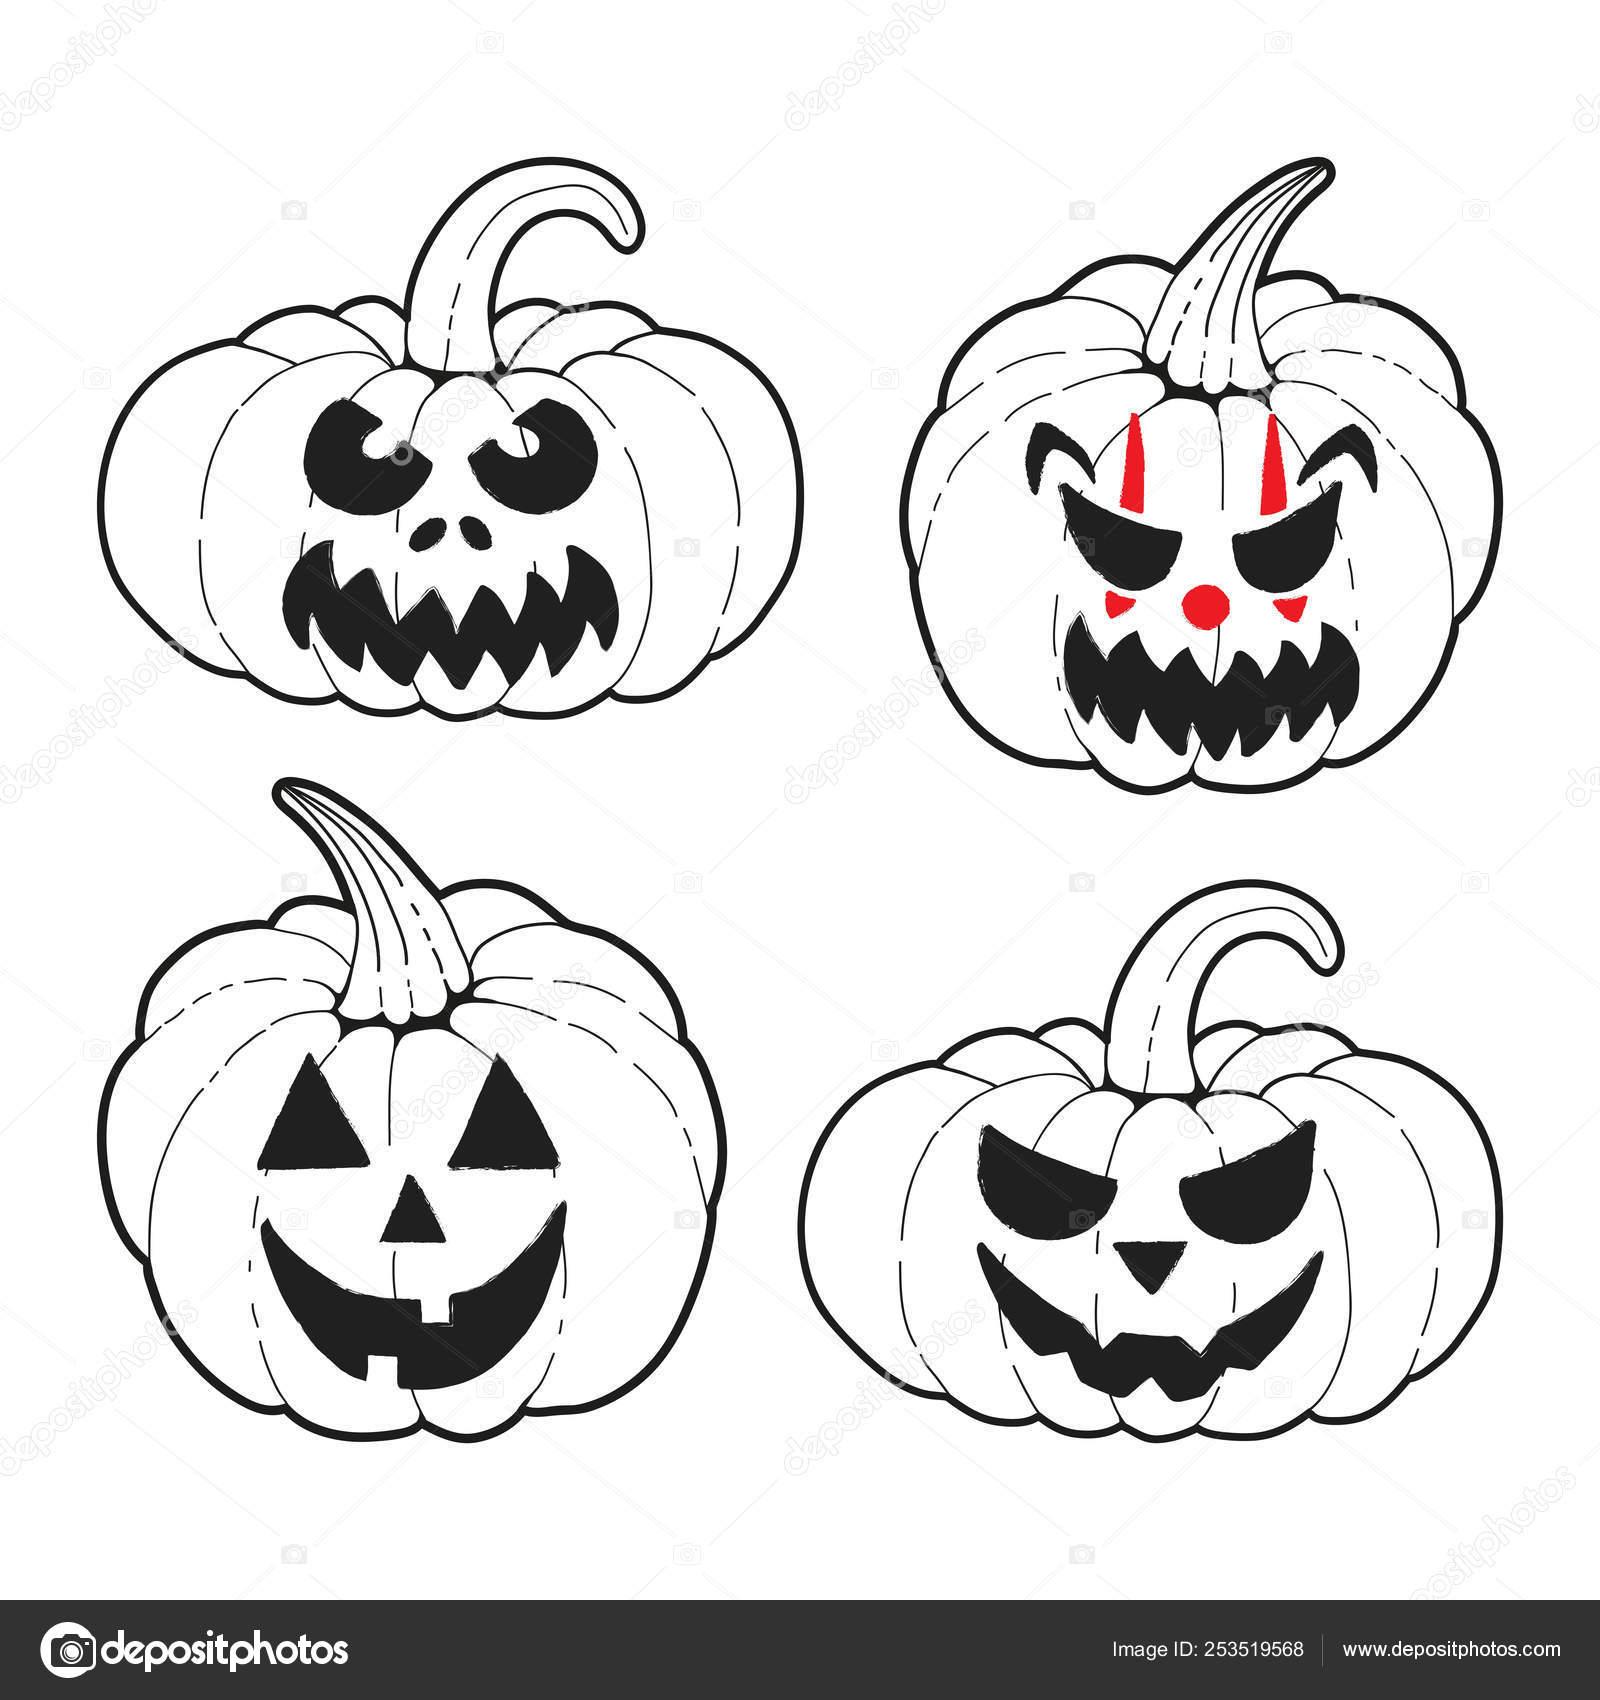 Vector Set Halloween Pumpkins Cute Scary Pumpkin Faces Ready Use Stock Vector C Orobin 253519568